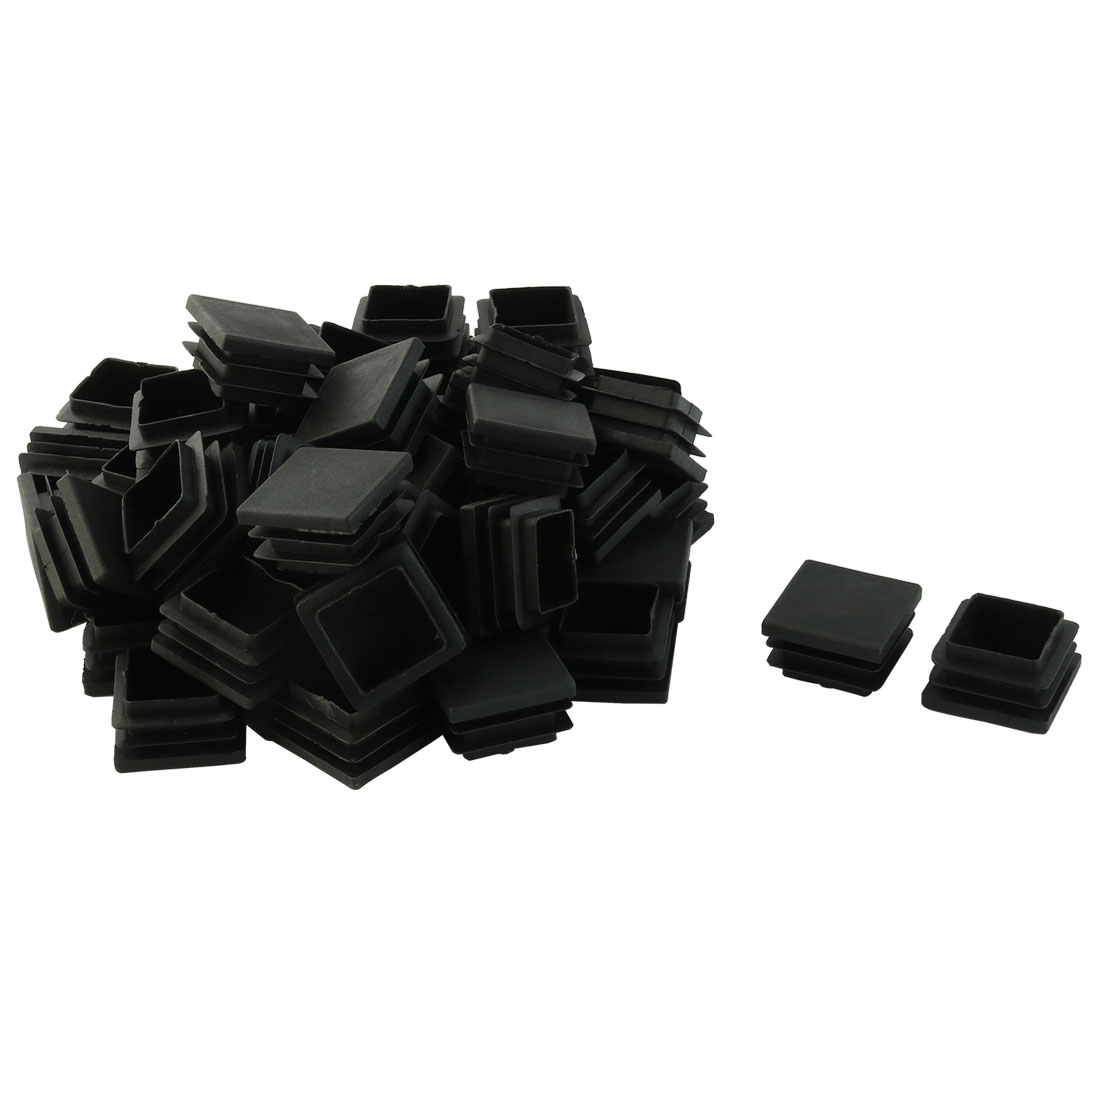 Plastic Square Design Tube Insert End Blanking Cover Cap Black 32 x 32mm 50pcs